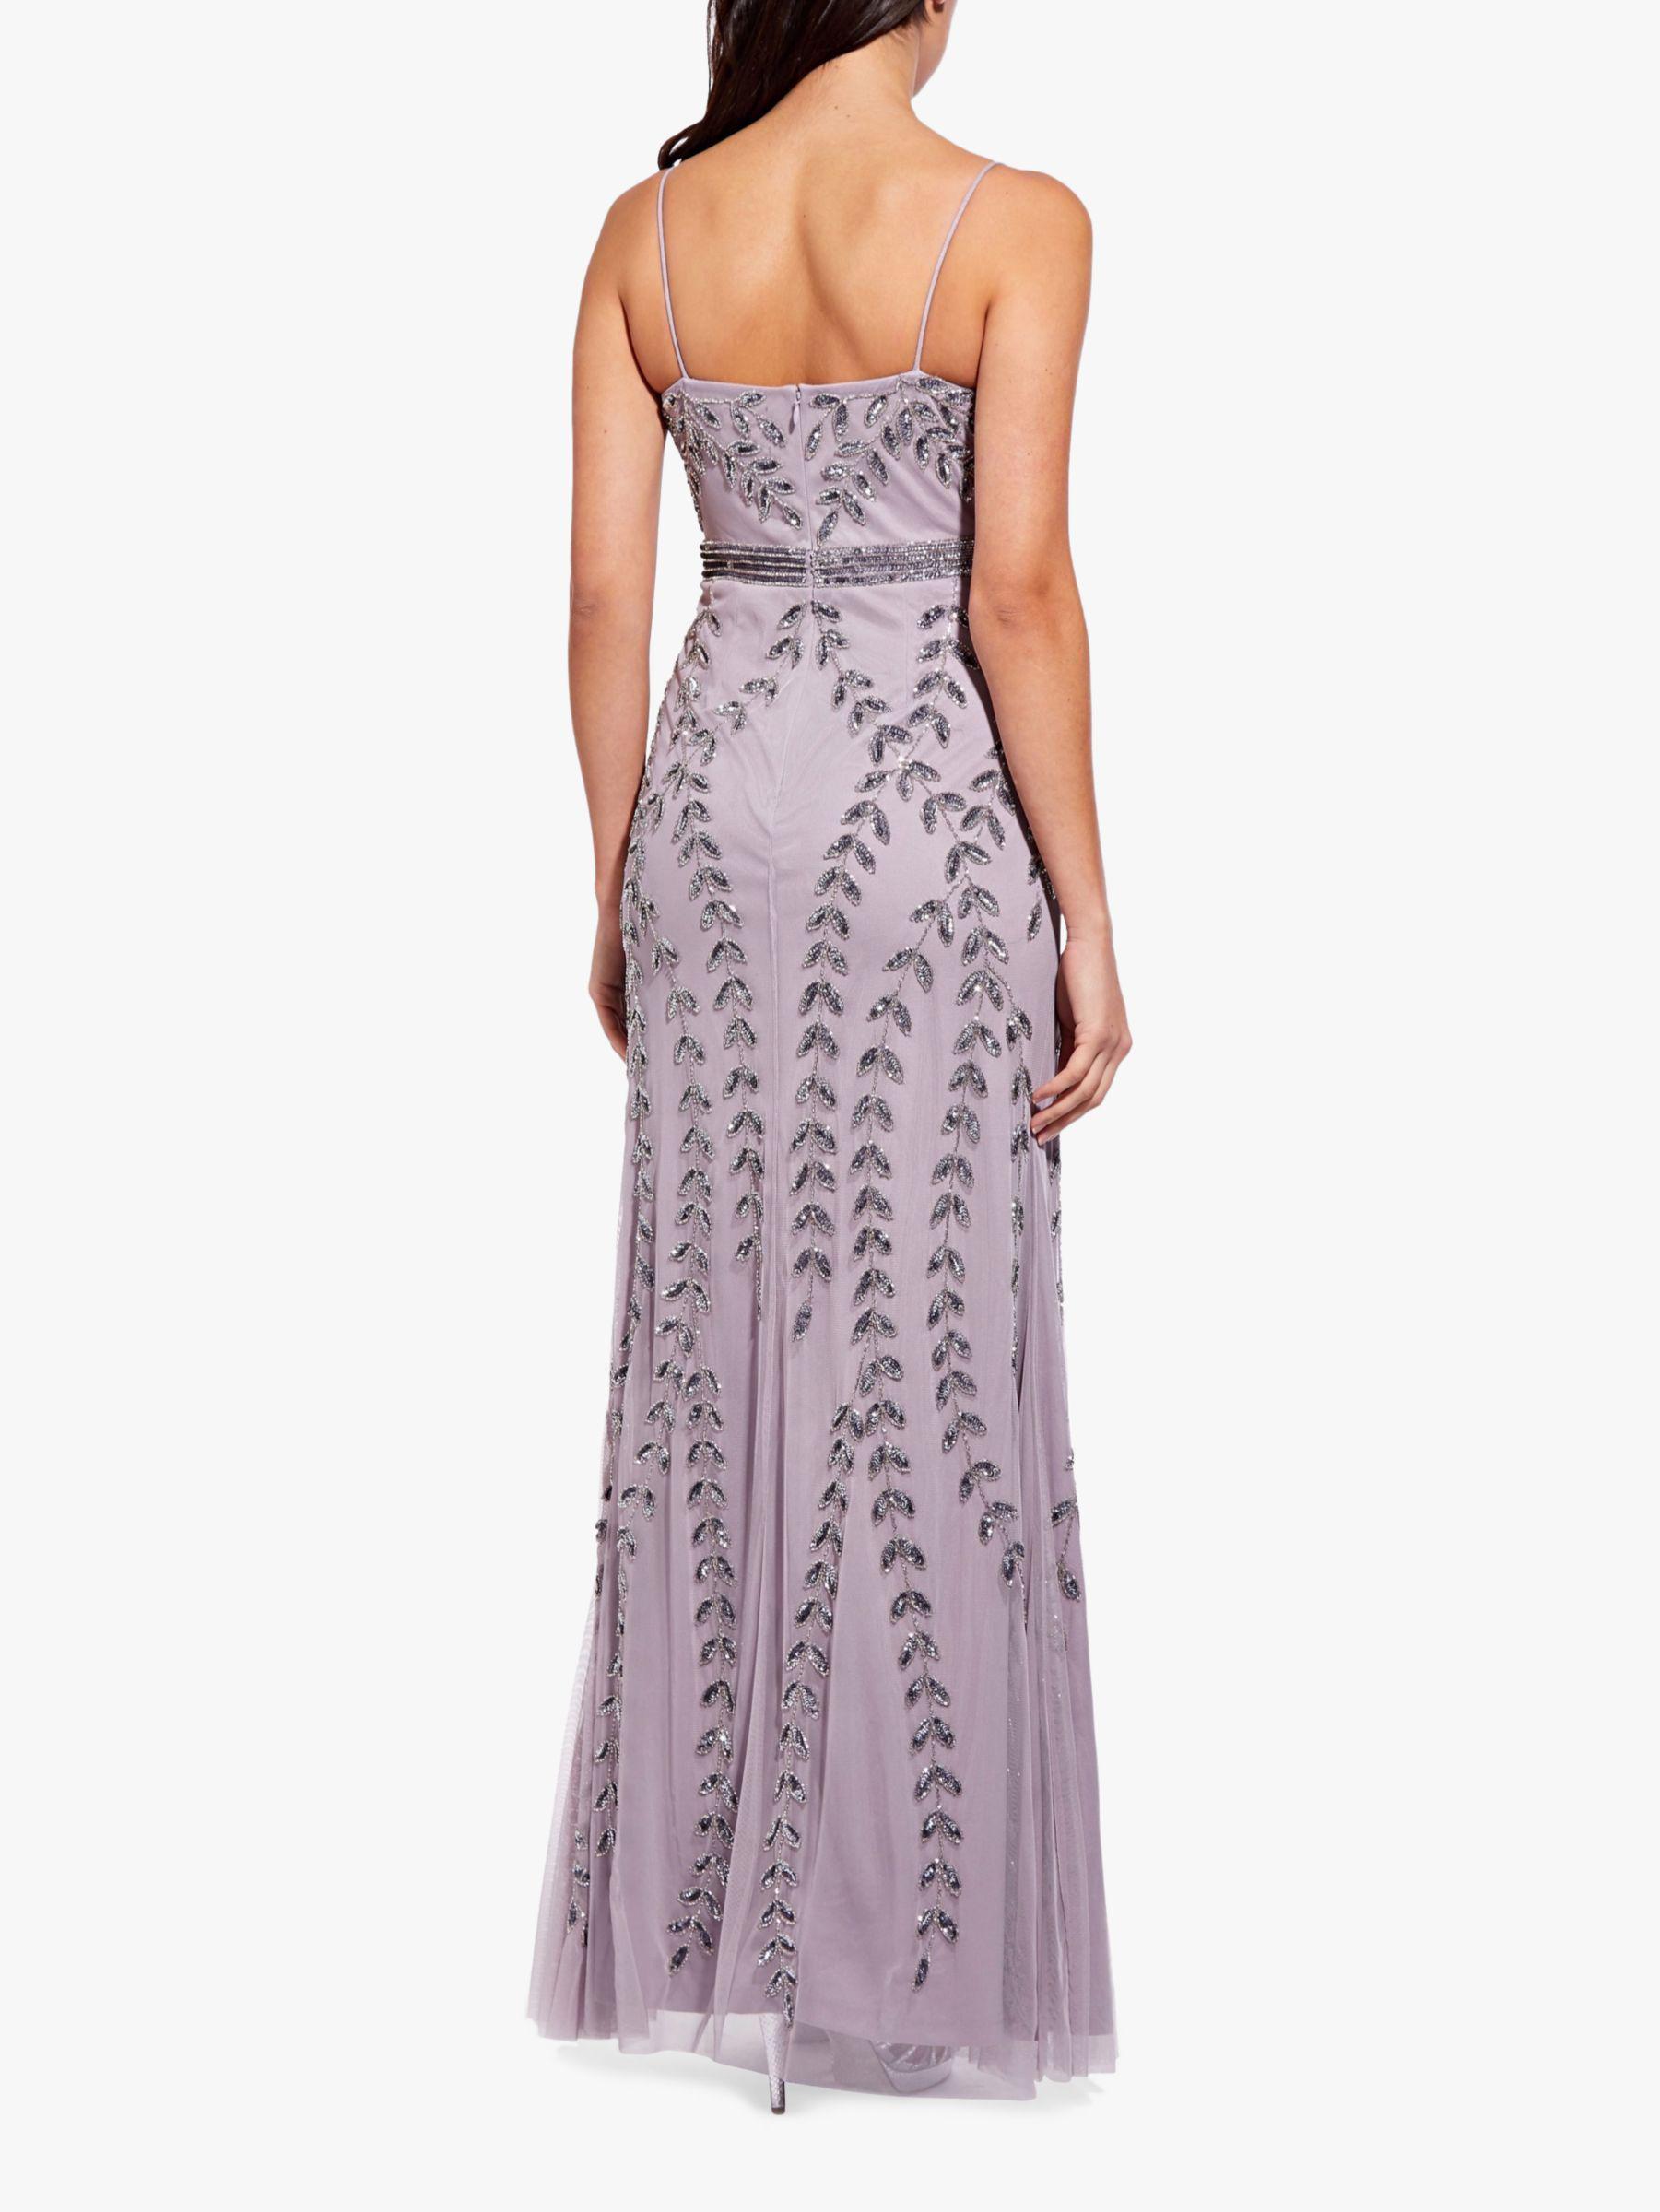 de27694238a18 Adrianna Papell Long Beaded Maxi Dress in Purple - Lyst